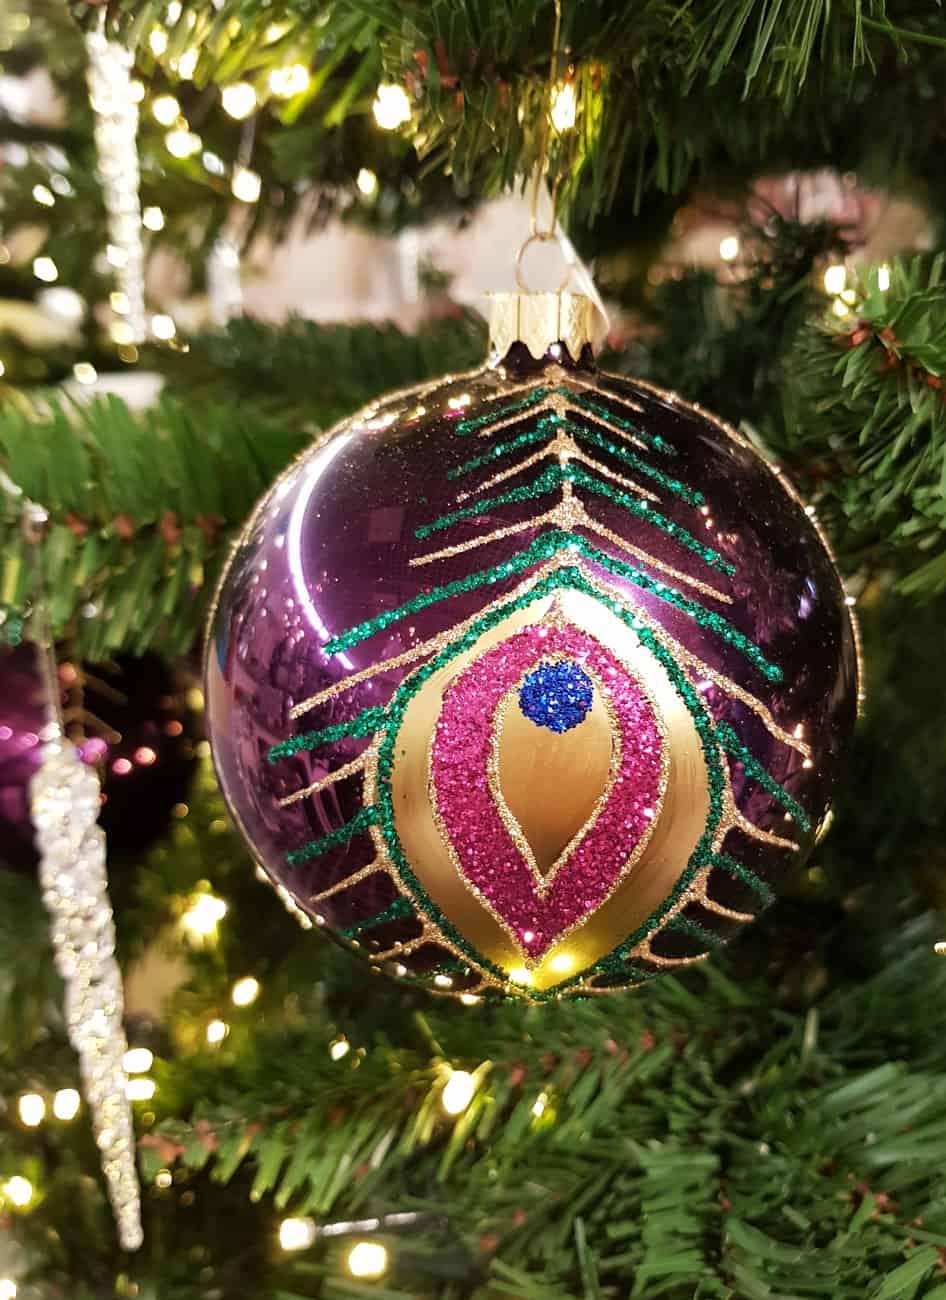 Christbaumkugeln Champagnerfarben.Weihnachtskugeln Lila Geschmackvoller Weihnachtsschmuck